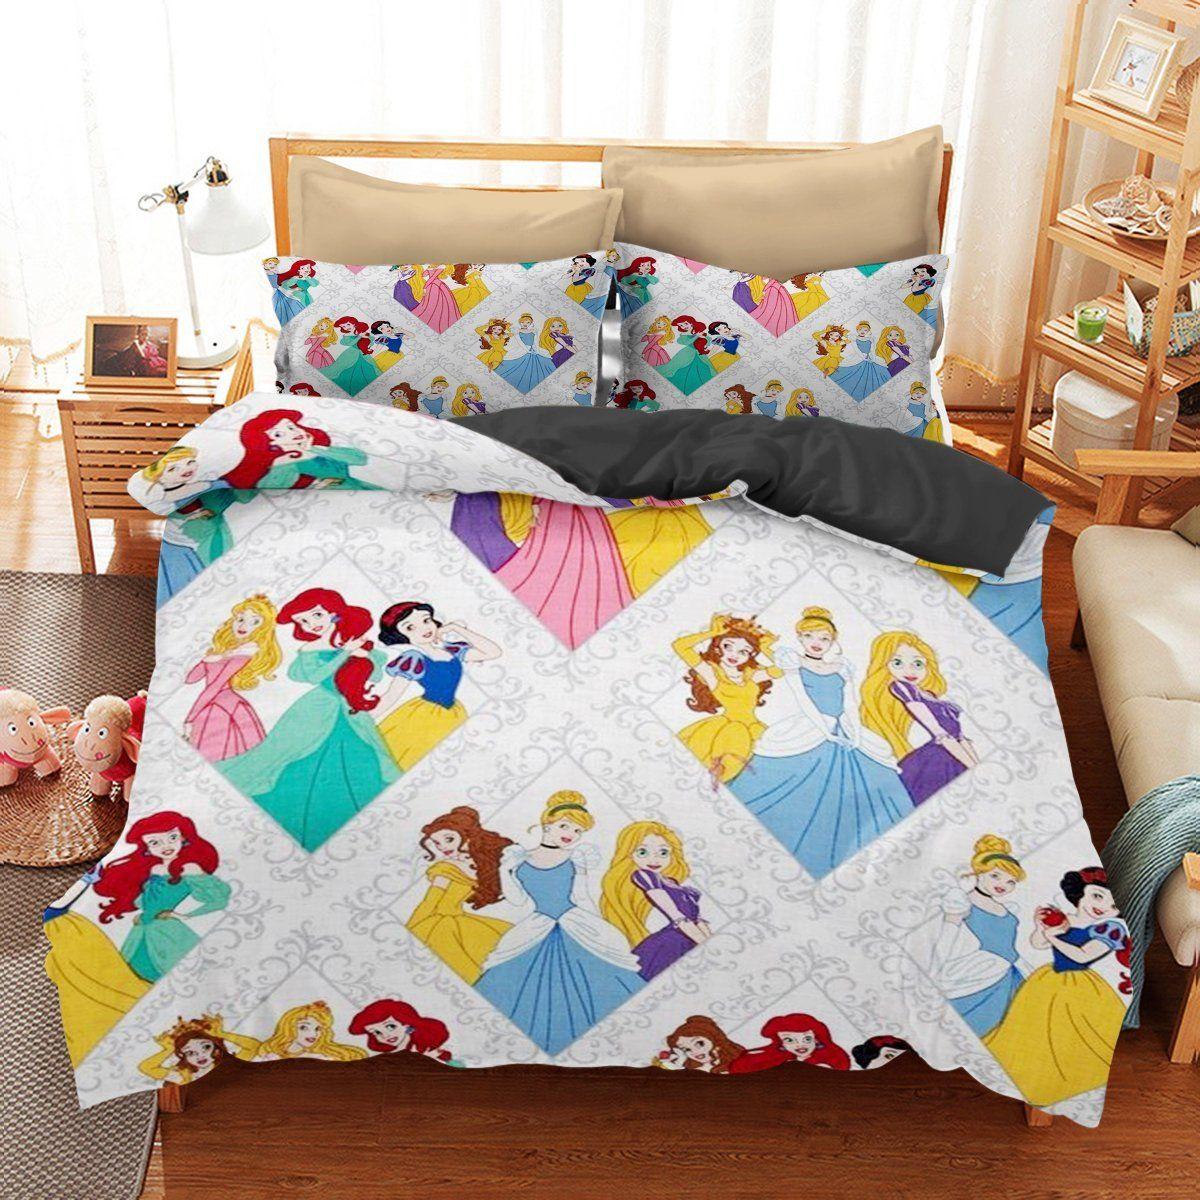 Bedding set disney princess funny gift idea disney